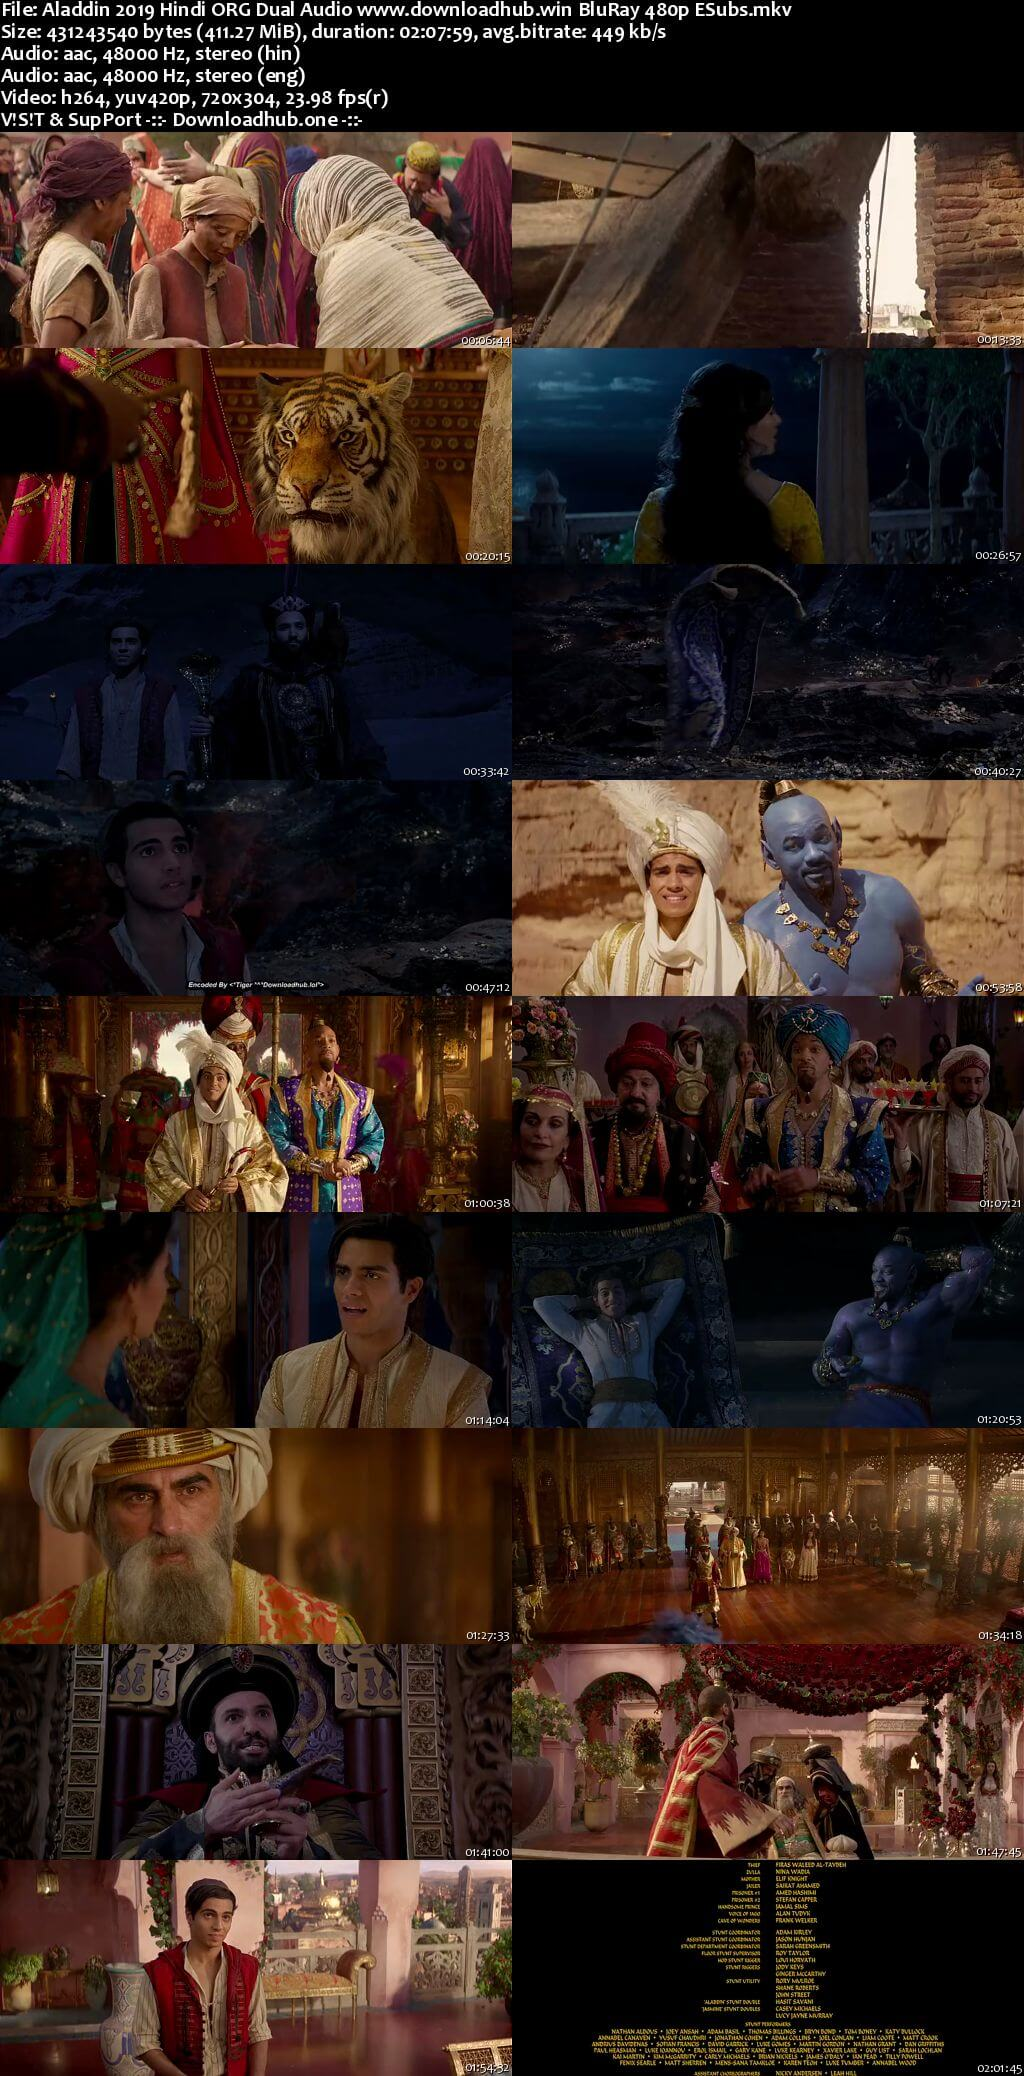 Aladdin 2019 Hindi ORG Dual Audio 400MB BluRay 480p ESubs